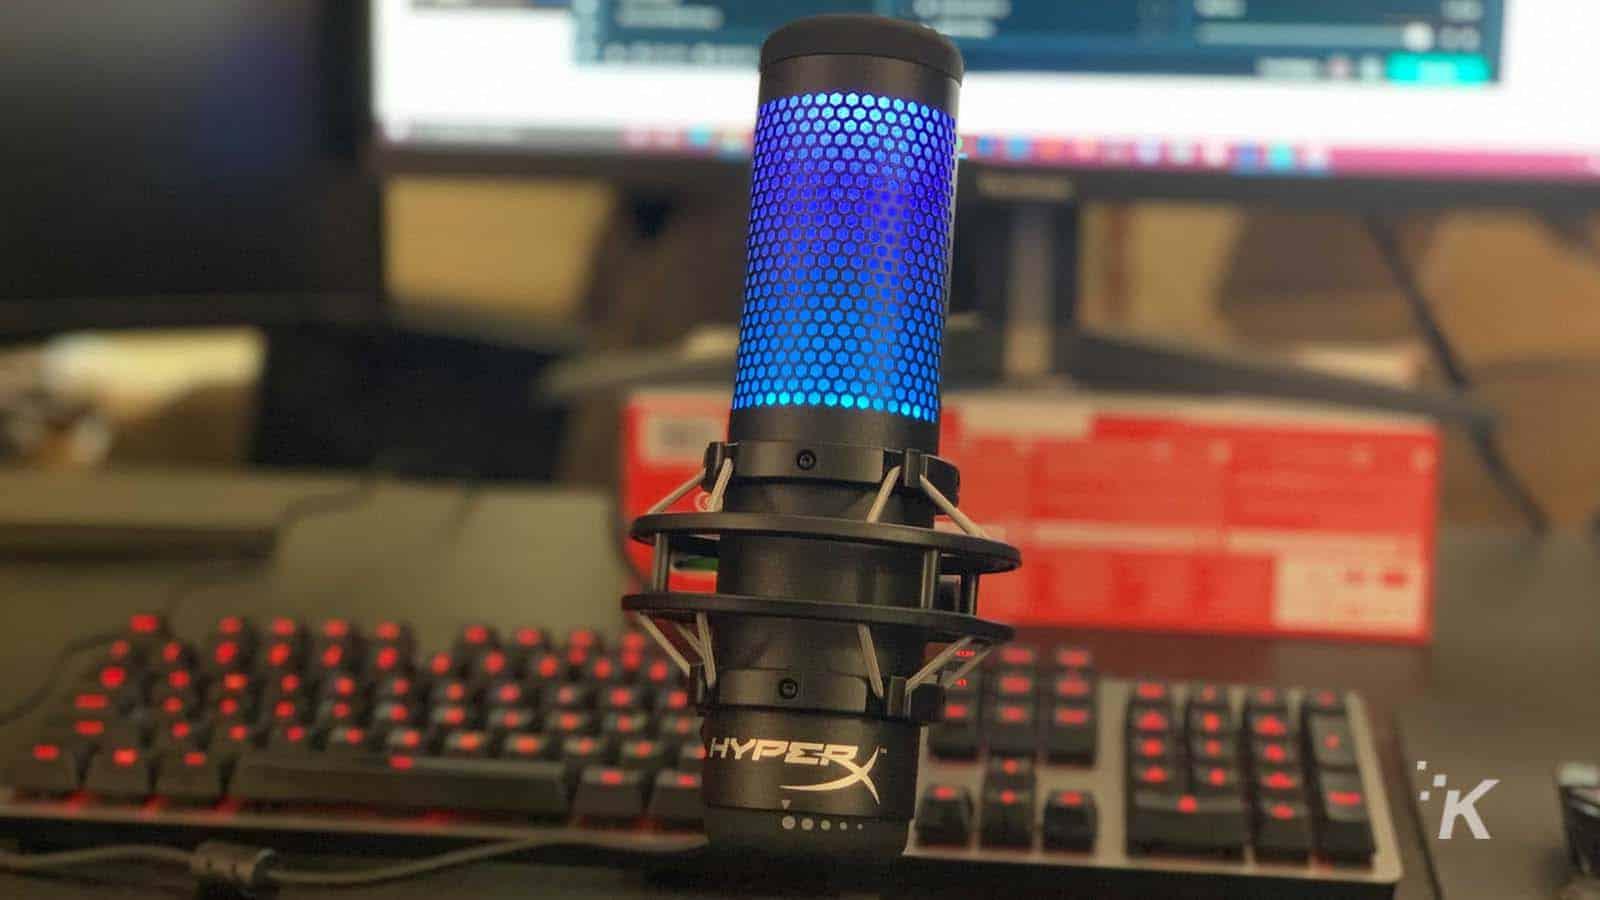 hyperx mic with rgb